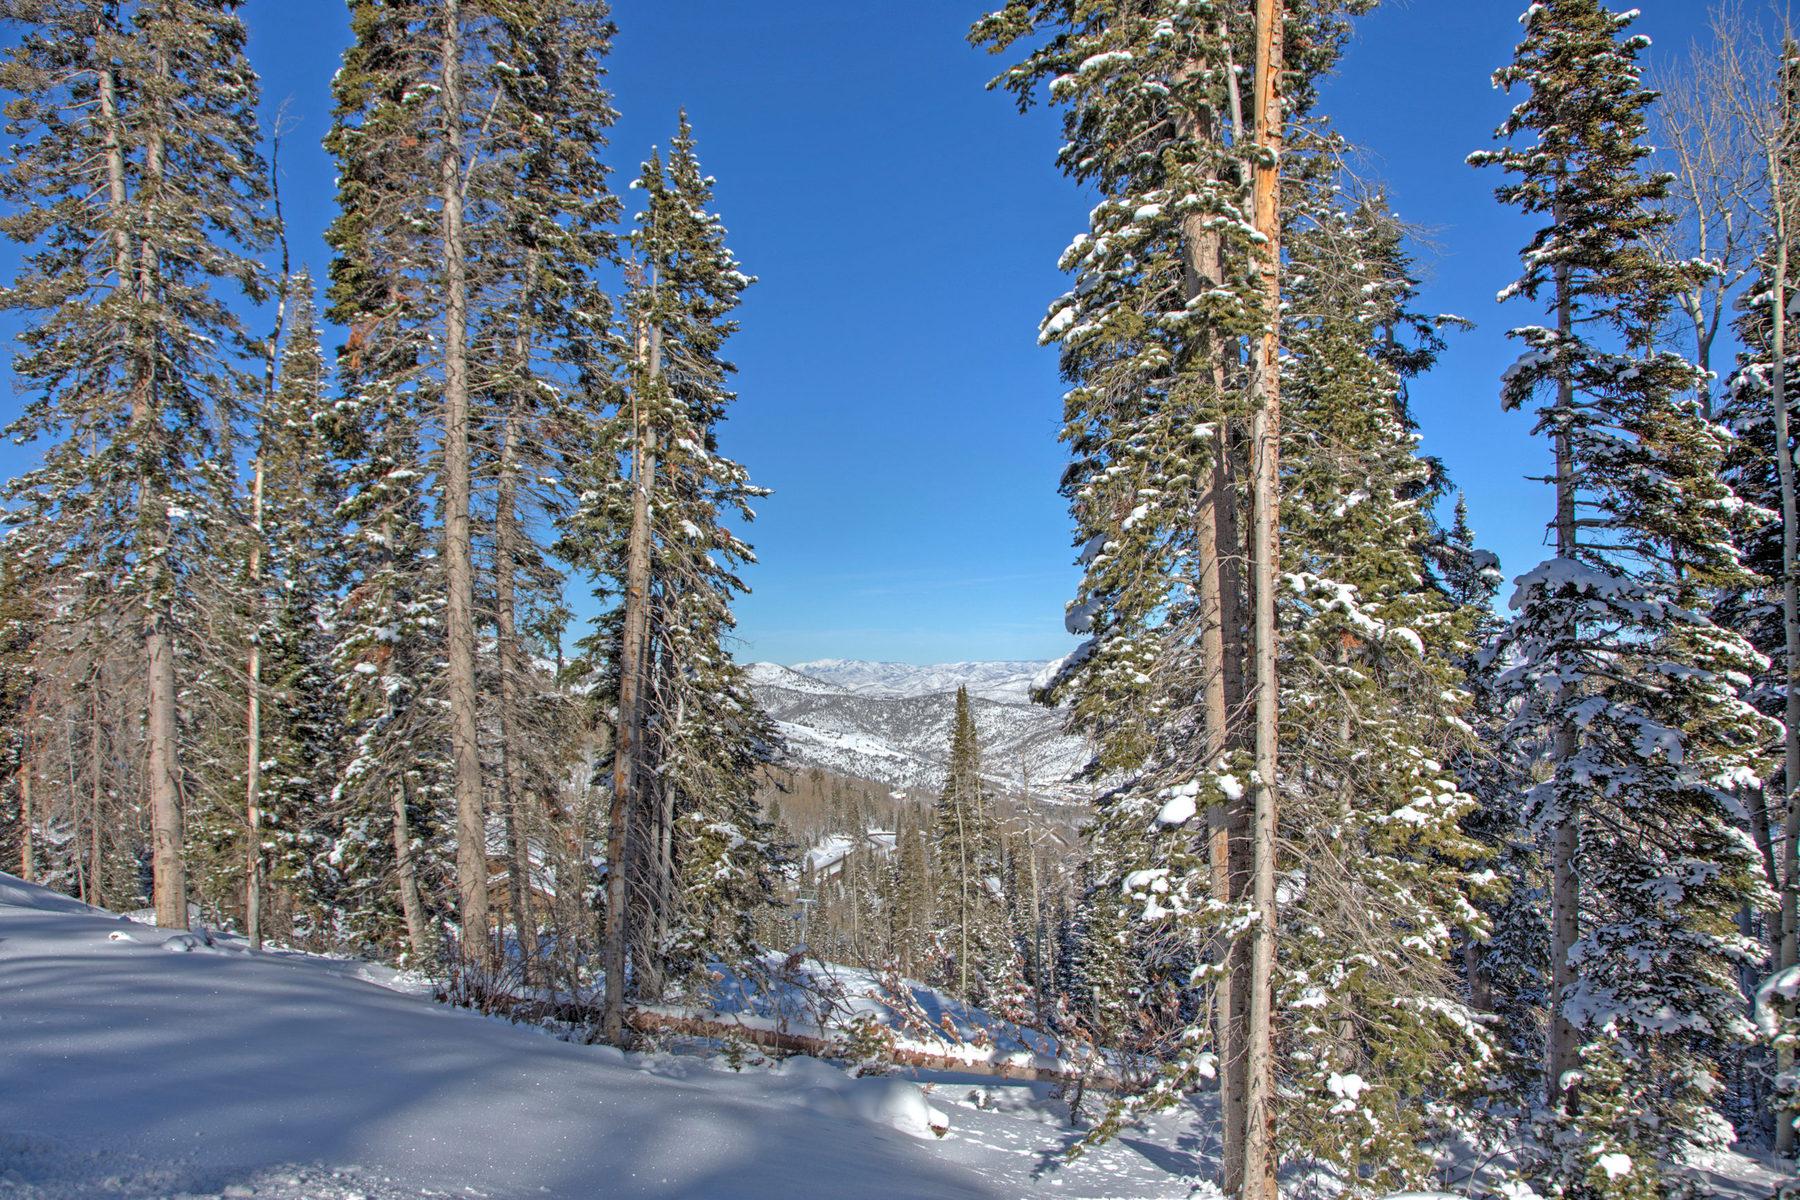 Земля для того Продажа на Ski-In/Out Colony Homesite 164 White Pine Canyon Rd Lot 164 Park City, Юта 84098 Соединенные Штаты